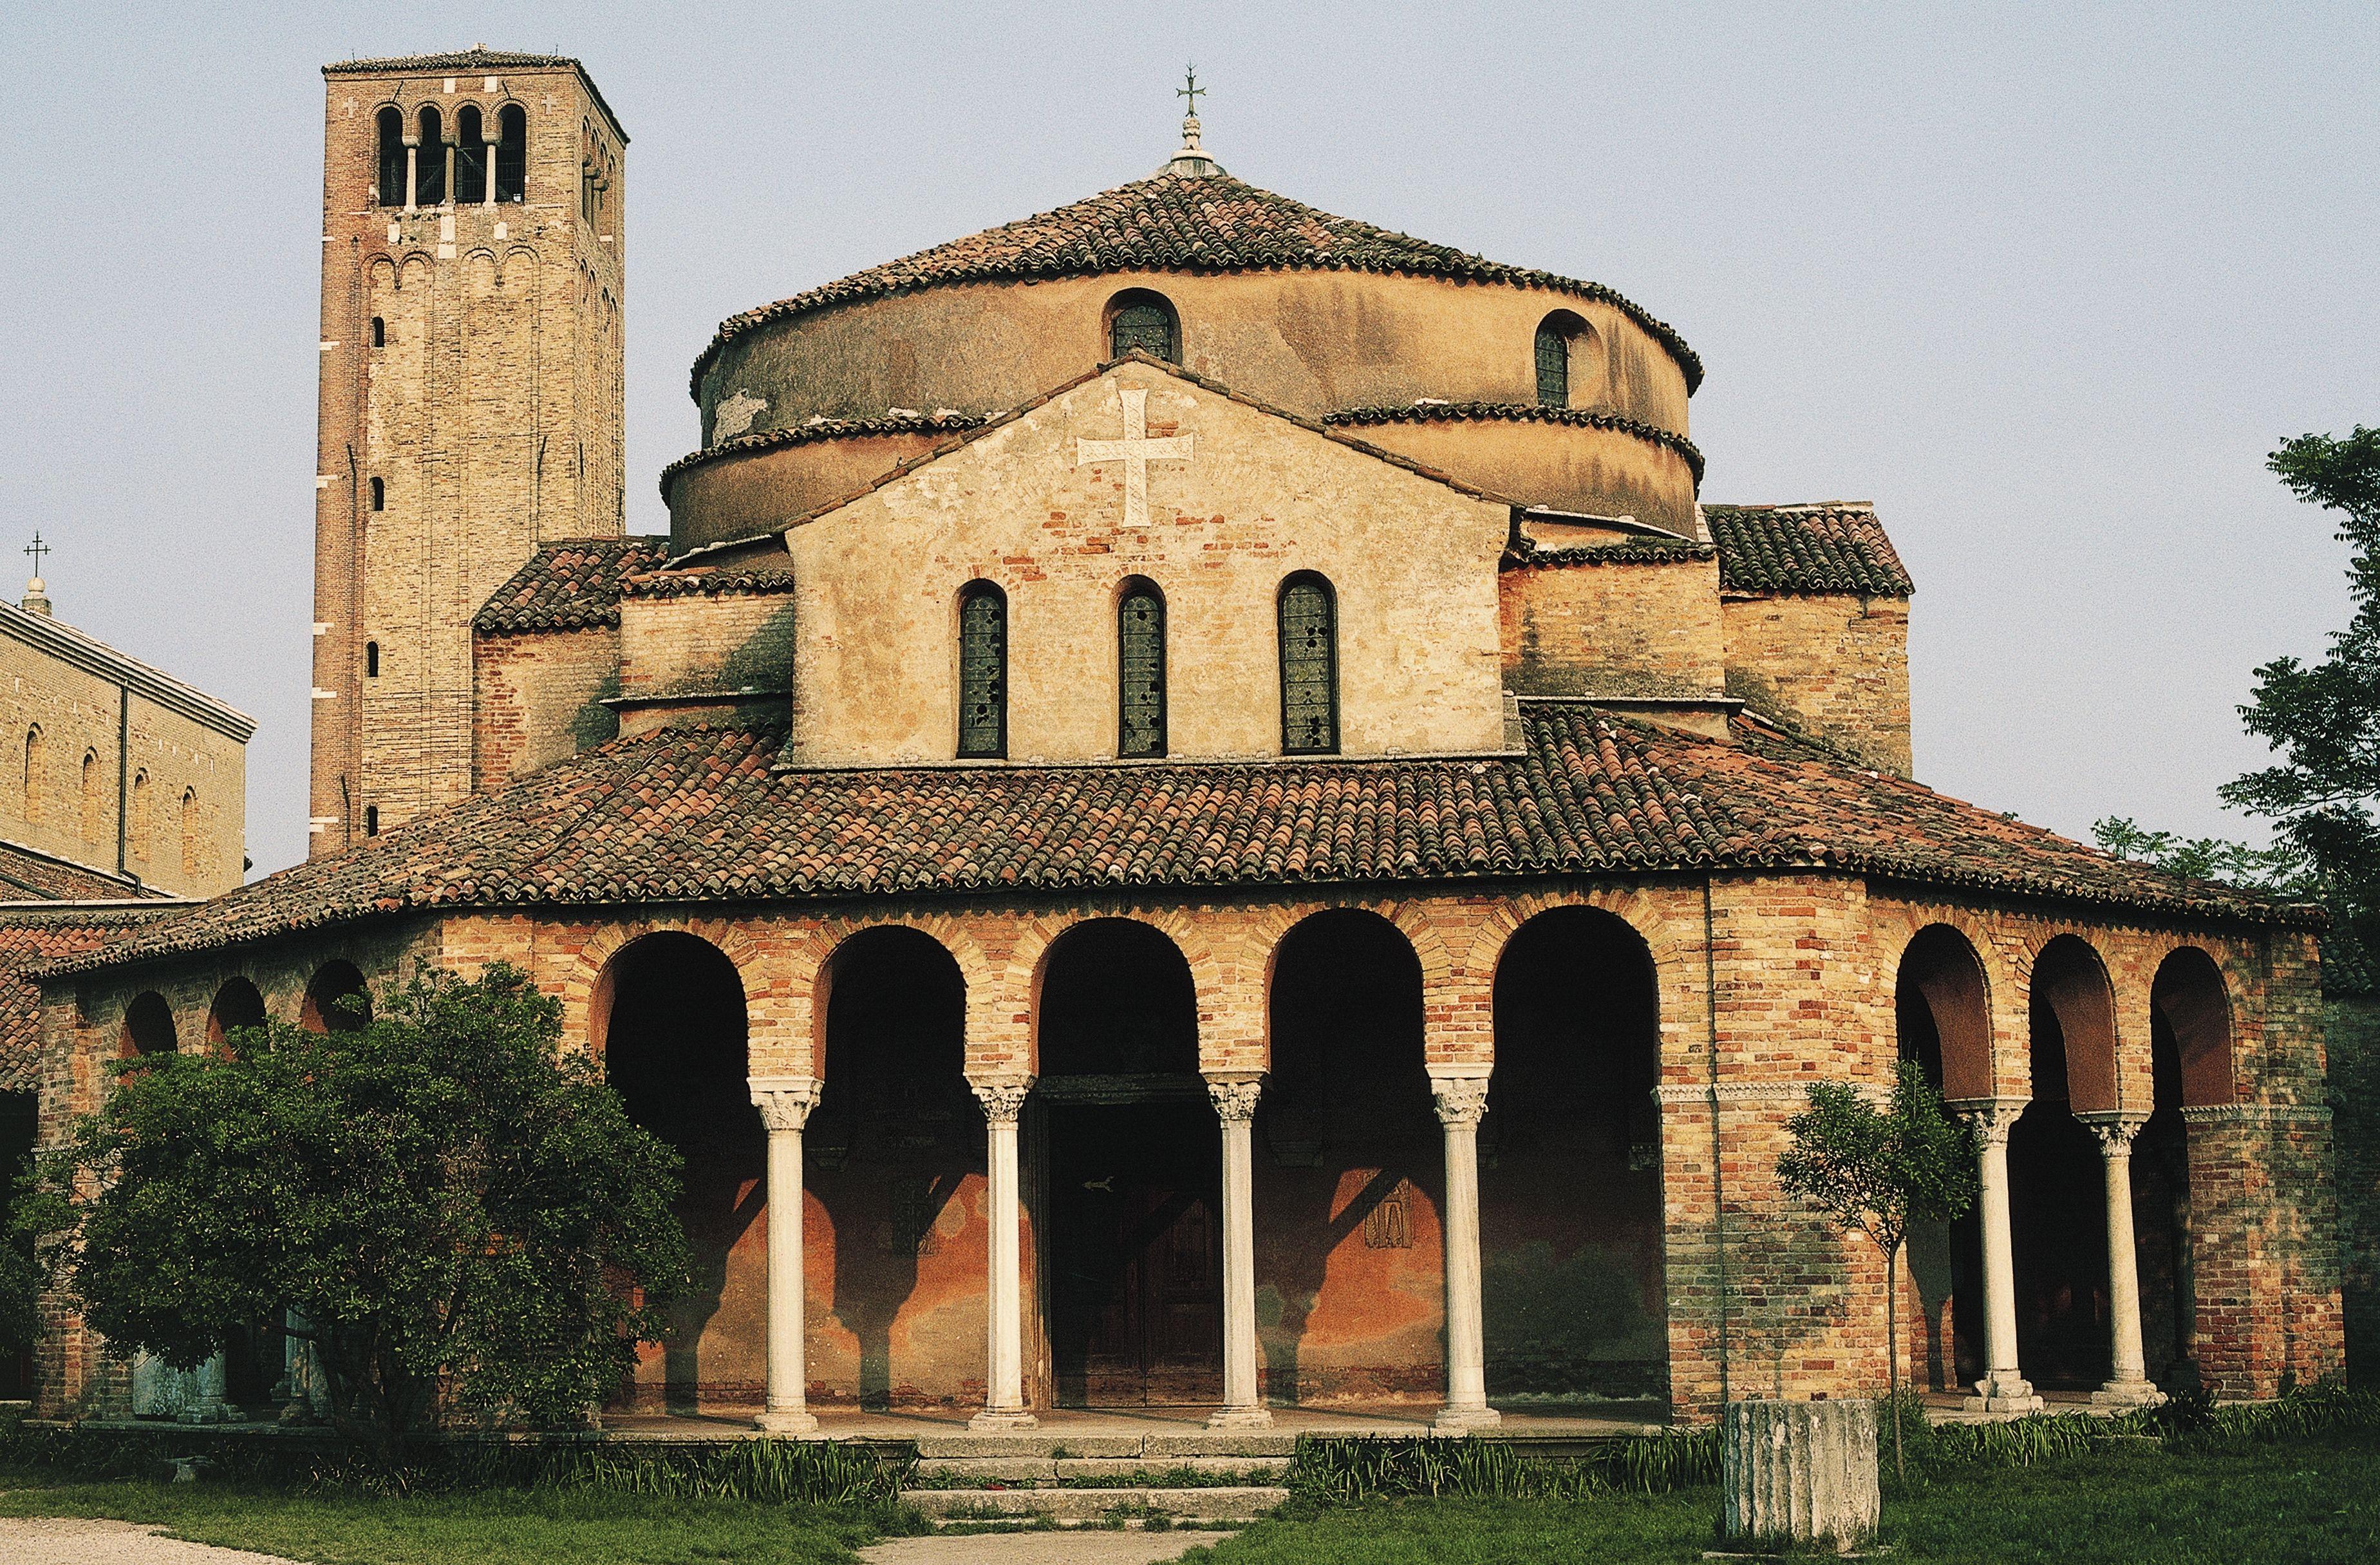 Facade of the Church of Santa Fosca (12th century), Torcello Island, Venice Lagoon (UNESCO World Heritage List, 1987), Veneto, Italy